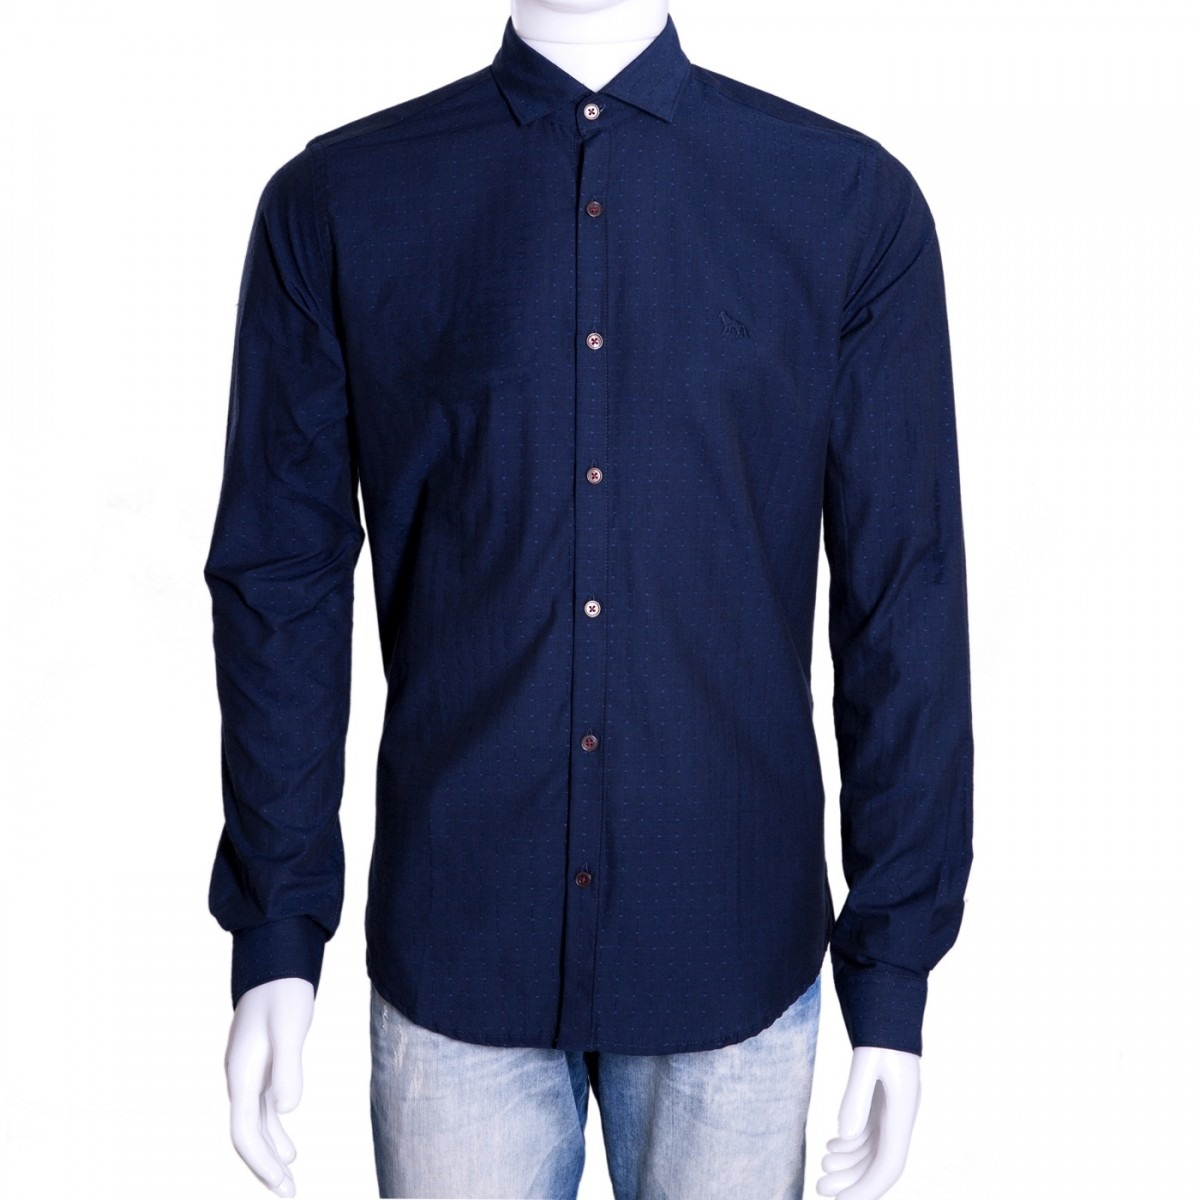 04d036ceb1 camisa social masculina acostamento manga longa 69101088. Carregando zoom.